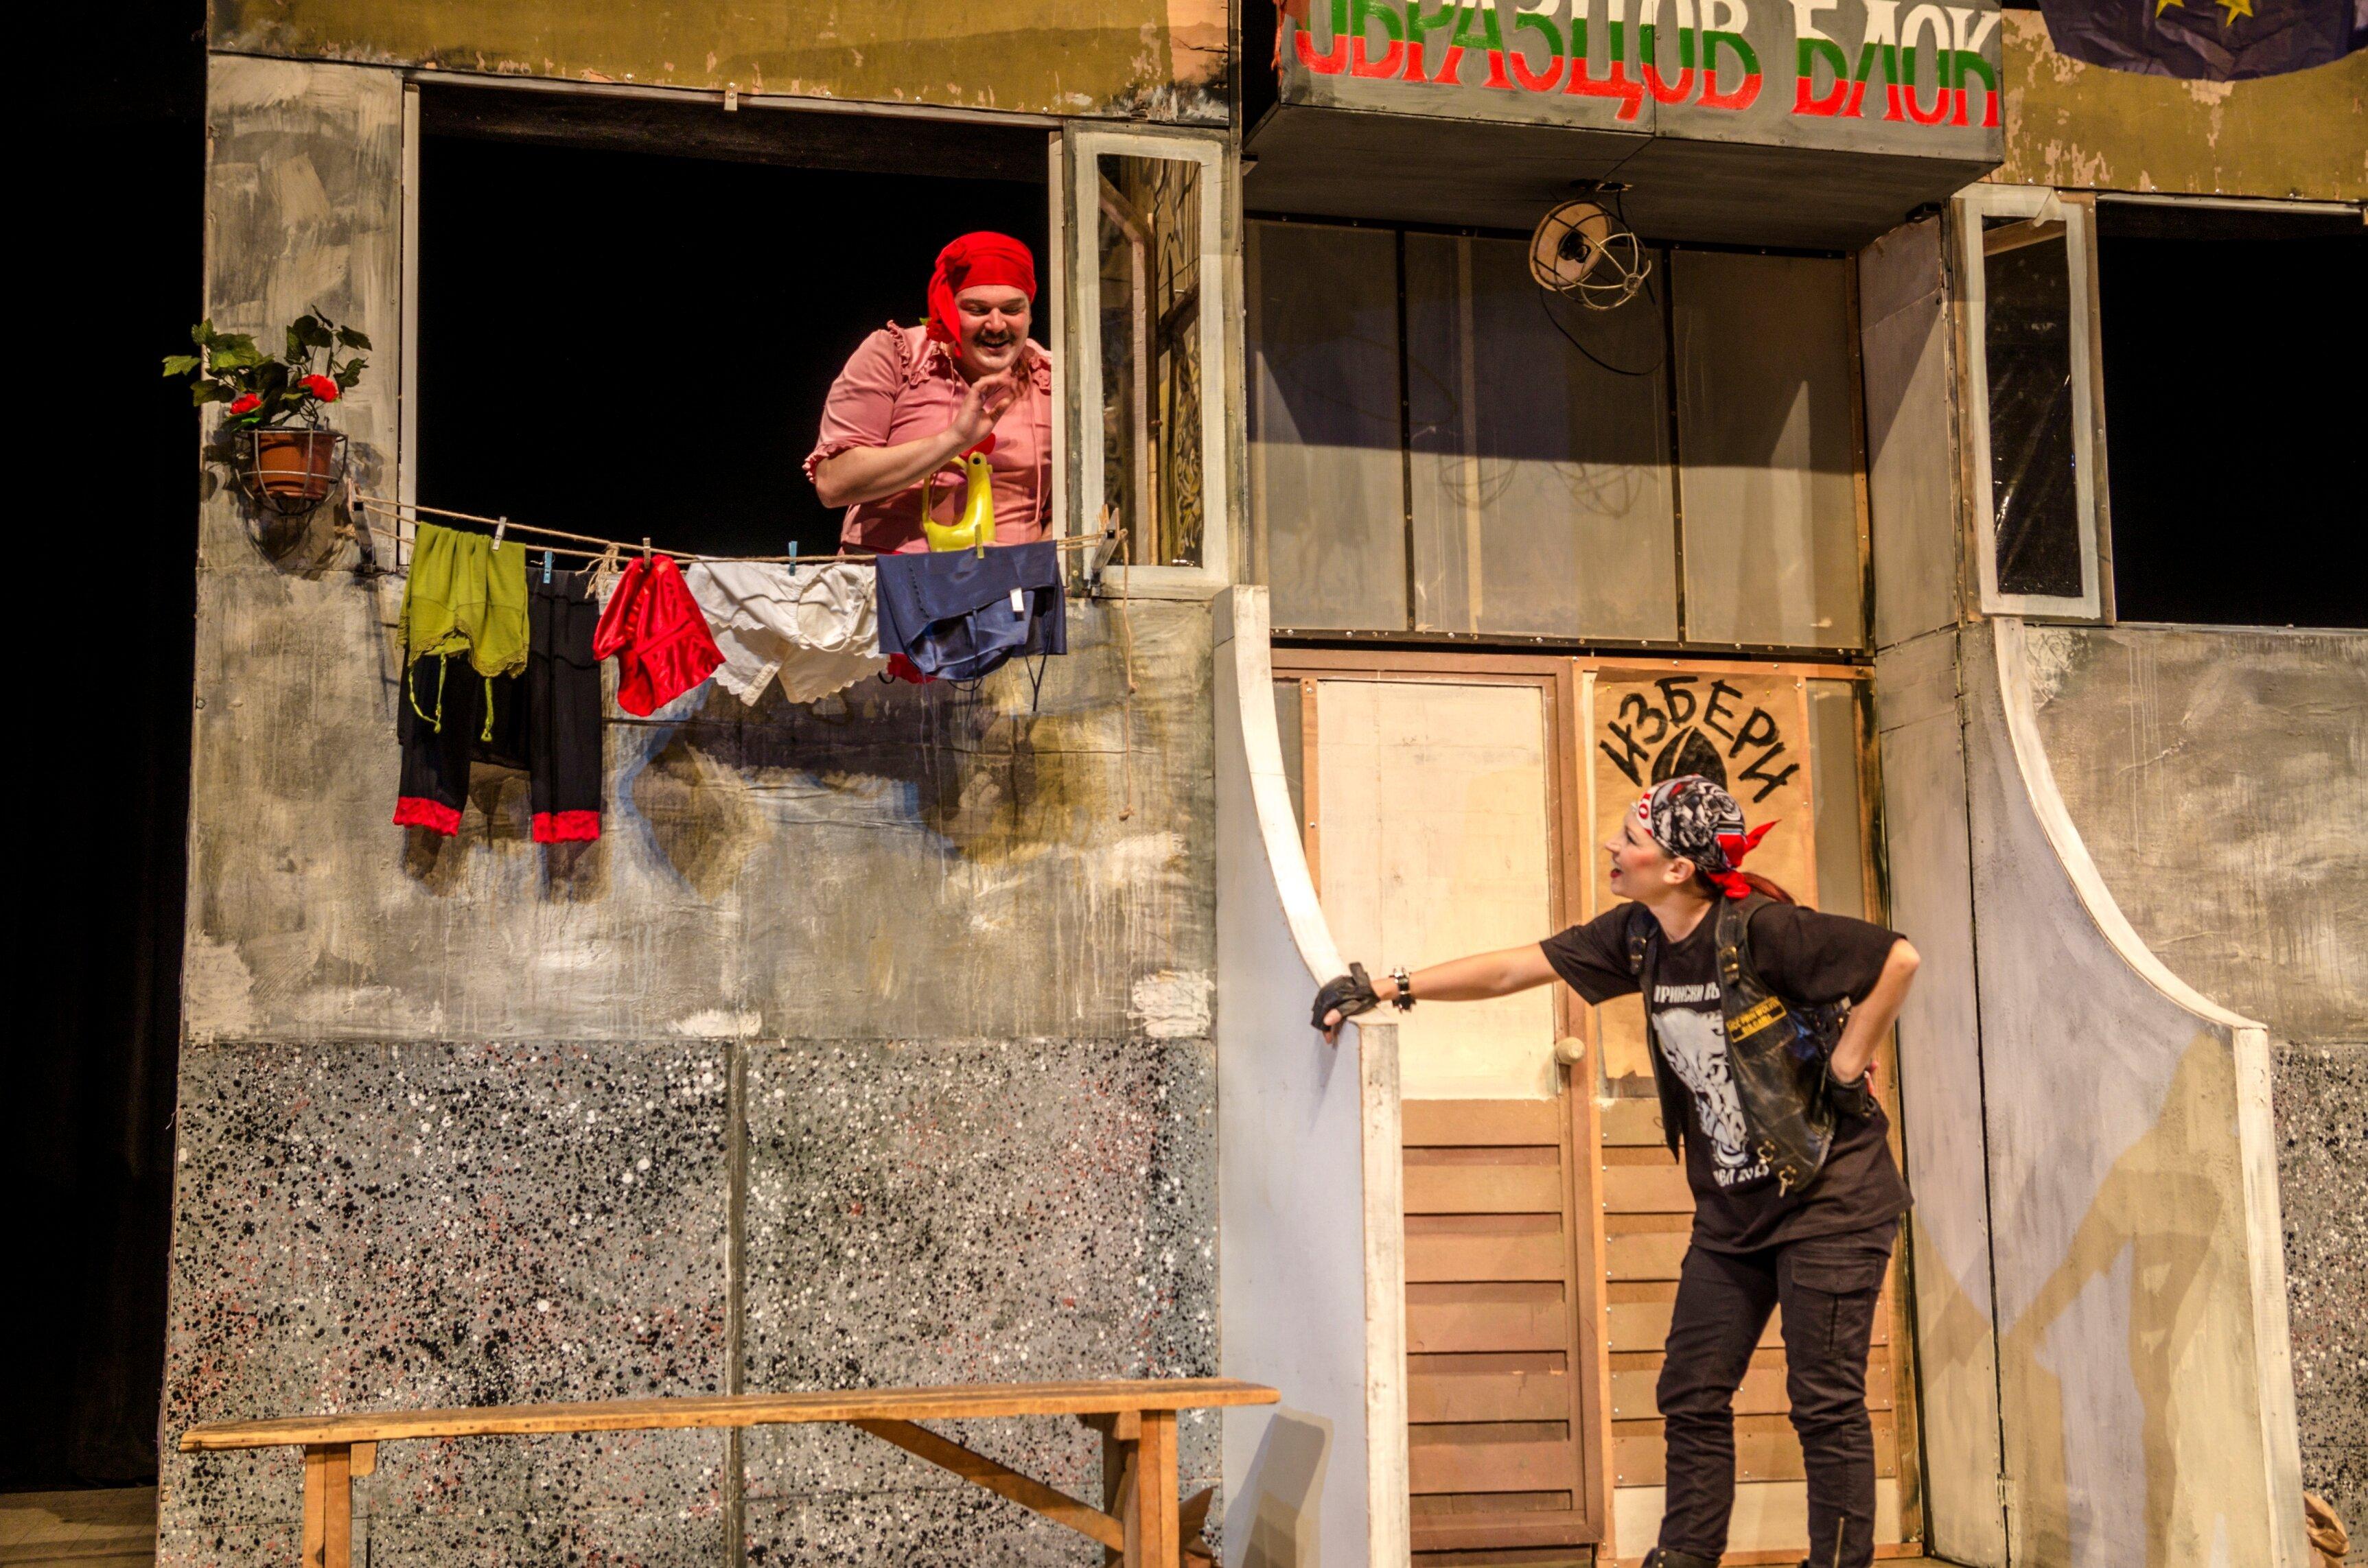 http://www.blagoevgradtheater.eu/images/_Snimki_ot_Teatyra/_igp0075.jpg